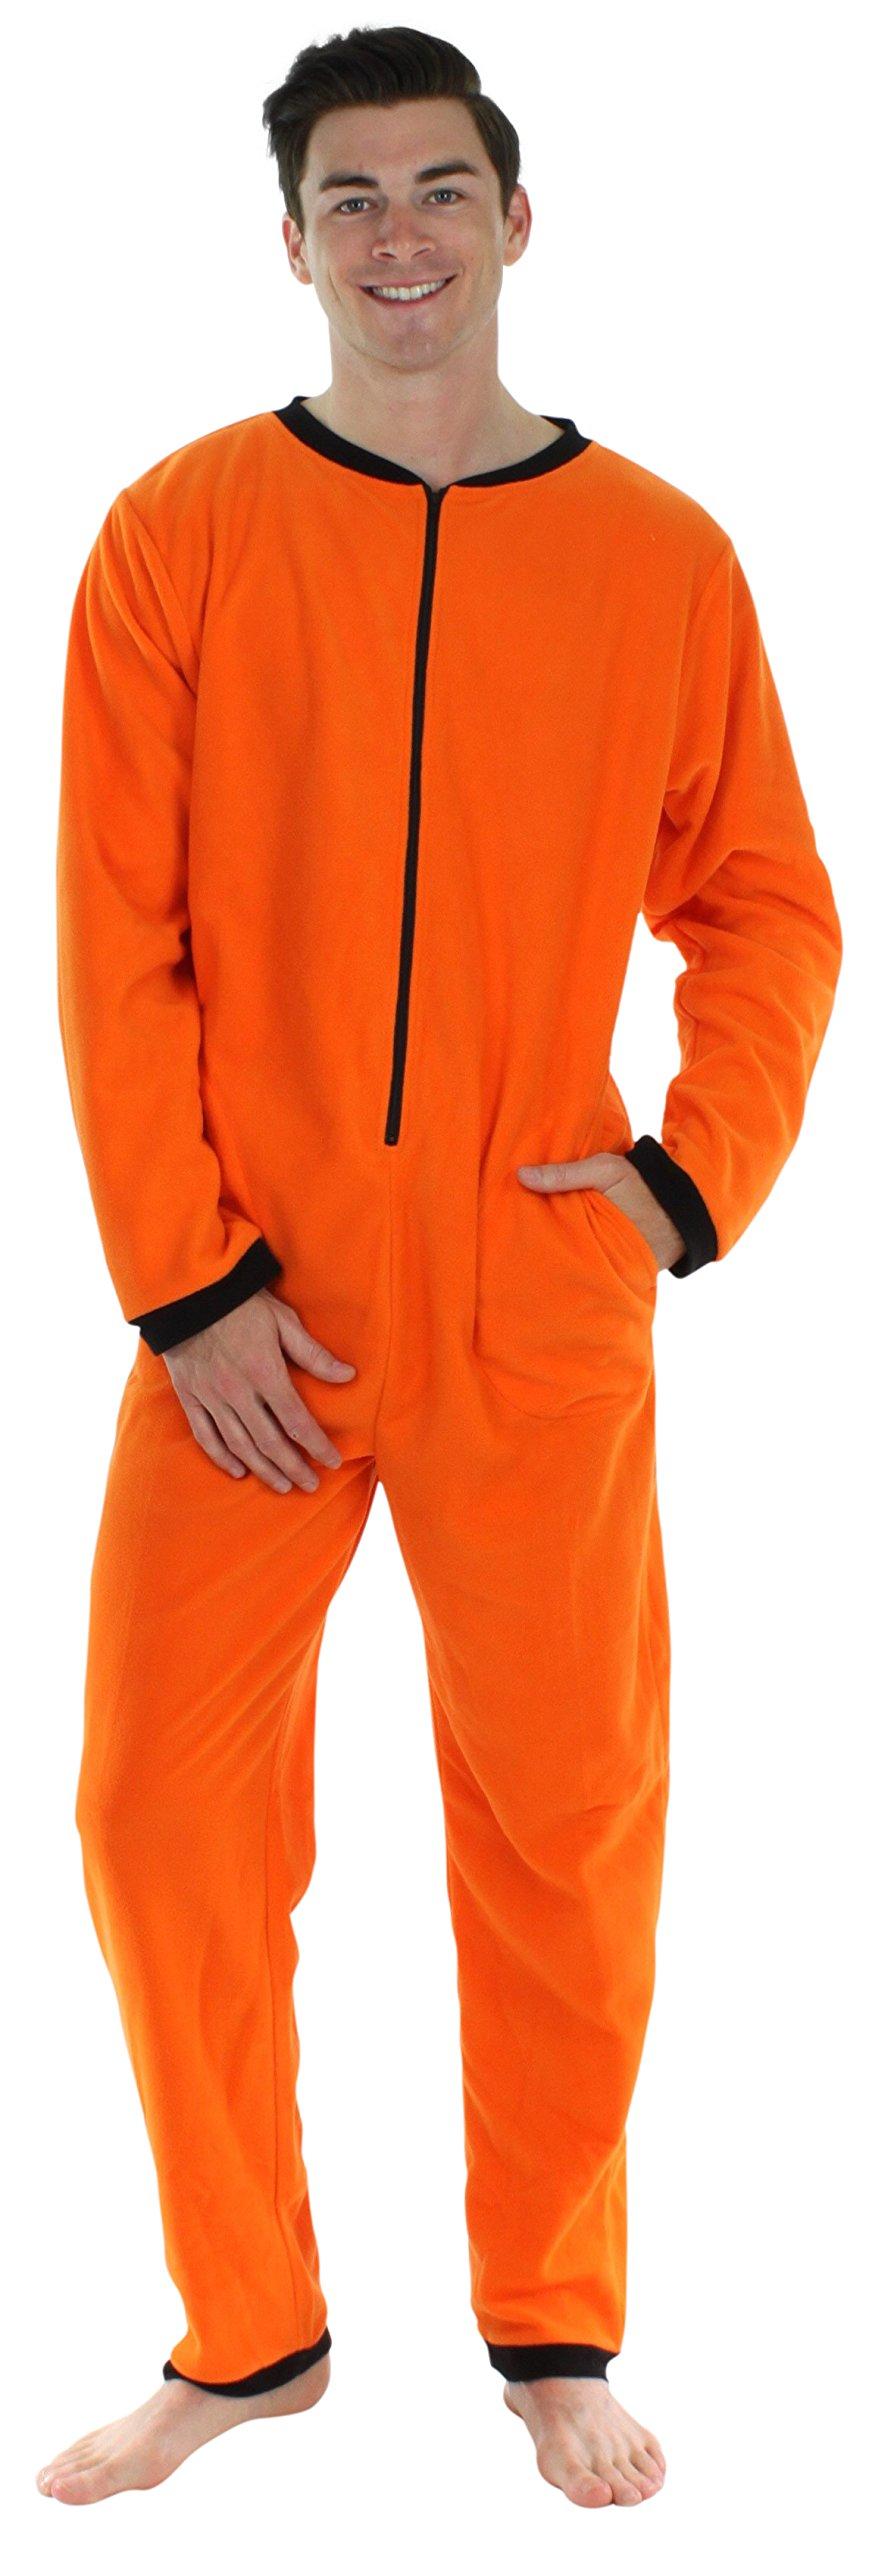 Sleepyheads Men's Adult Non Footed Fleece Color Onesie Pajama Jumpsuit (SH2200-4030-MED), Orange W-Black Zipper, Medium by Sleepyheads